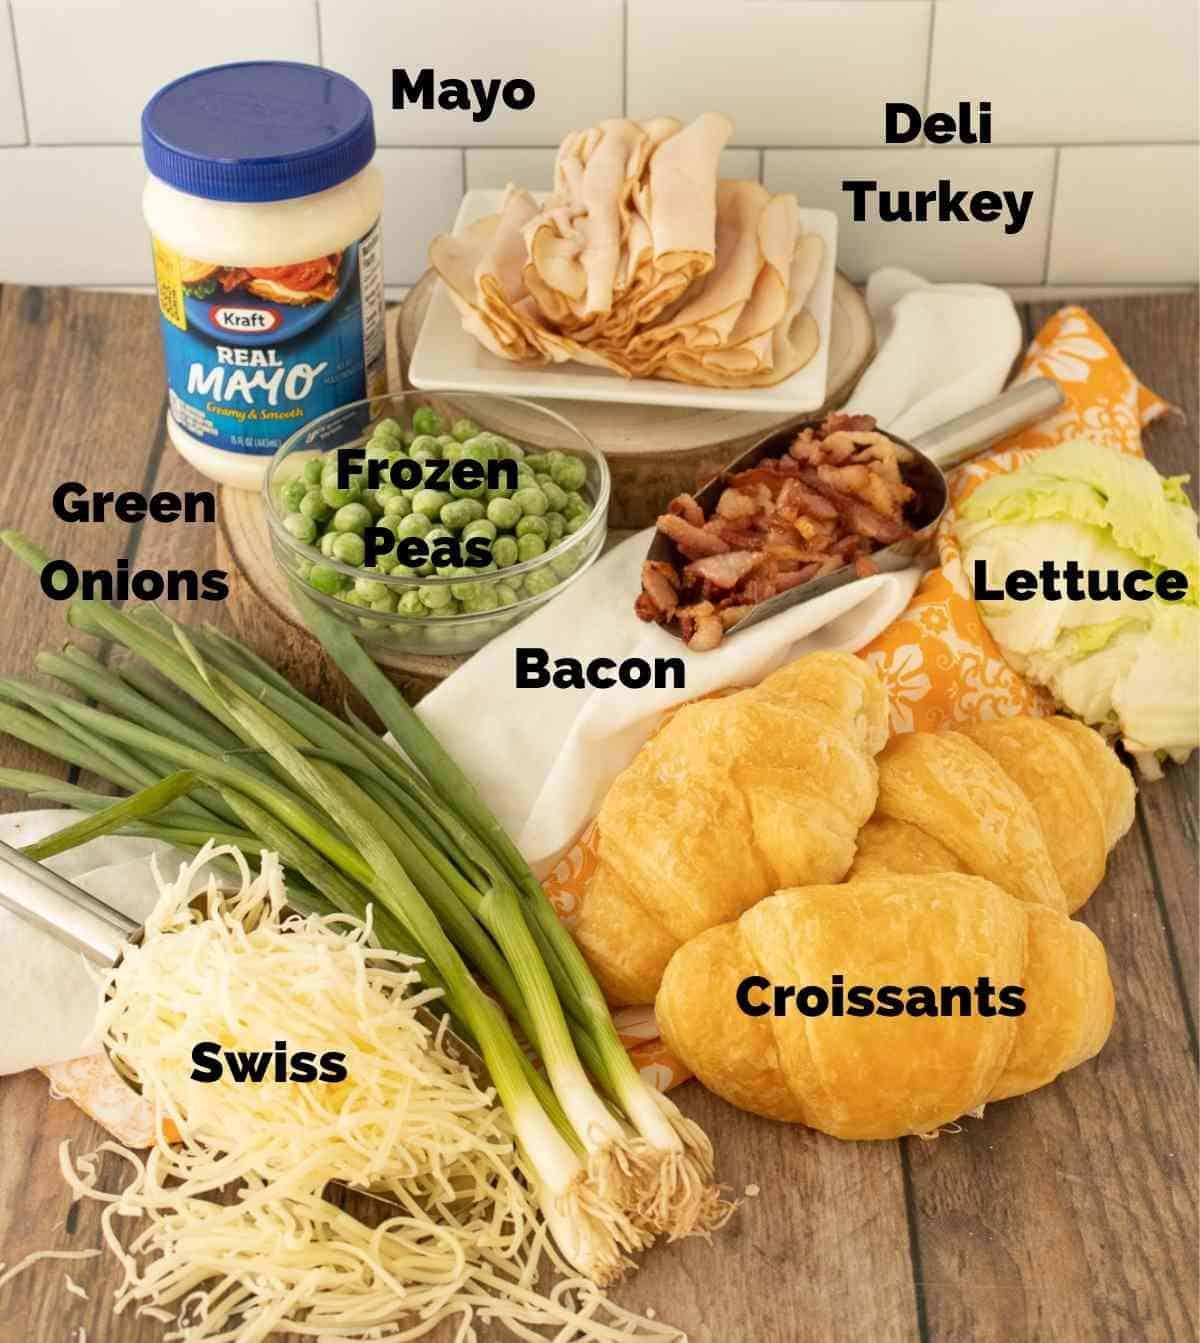 Ingredients for turkey salad croissants.